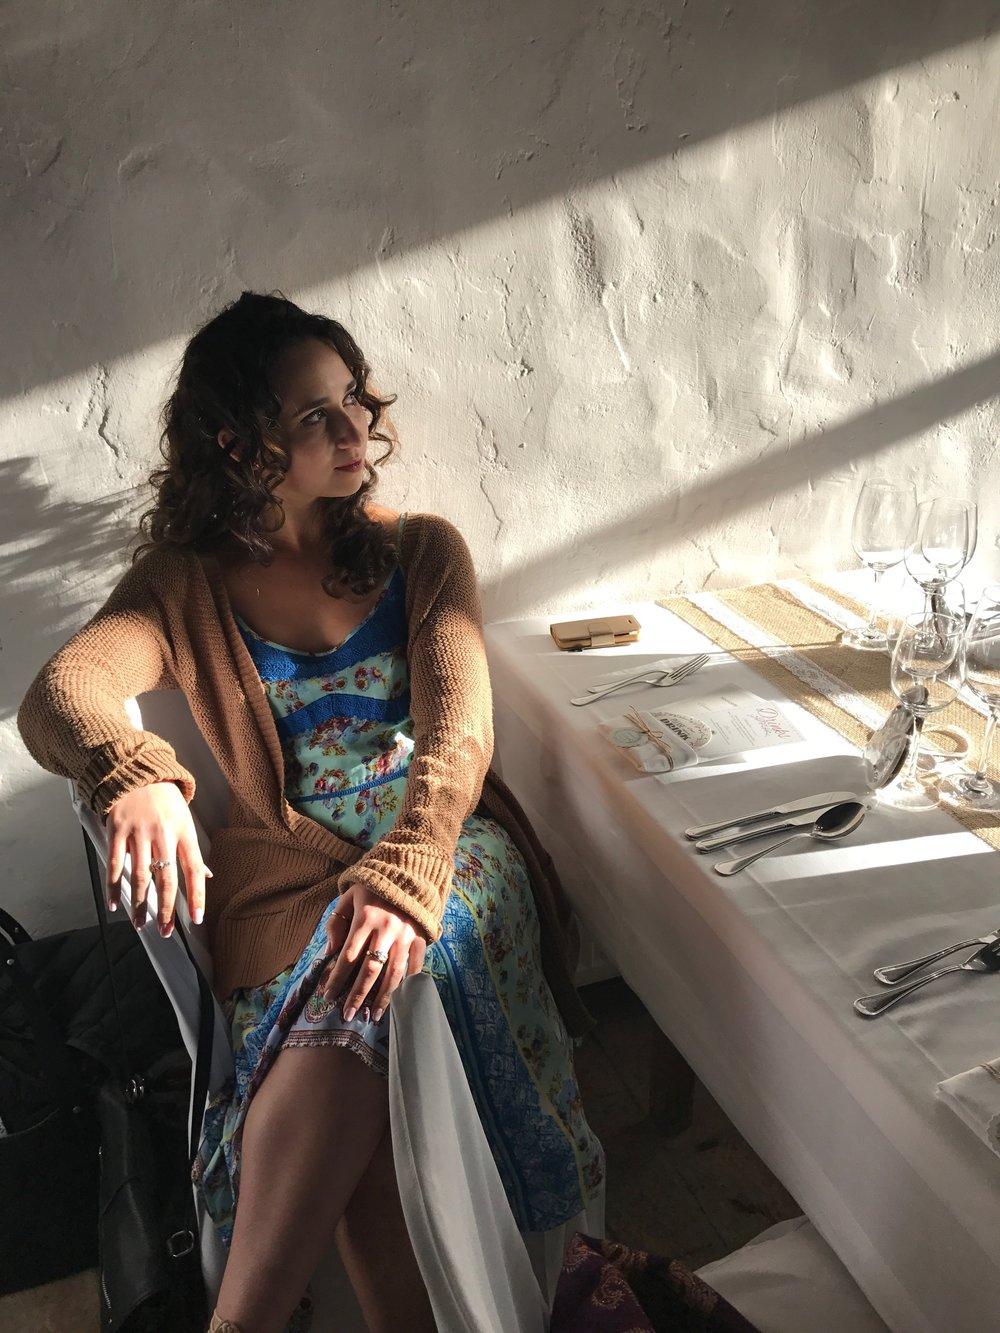 You are a habit I don't plan on breaking - -Lisette Glodowski